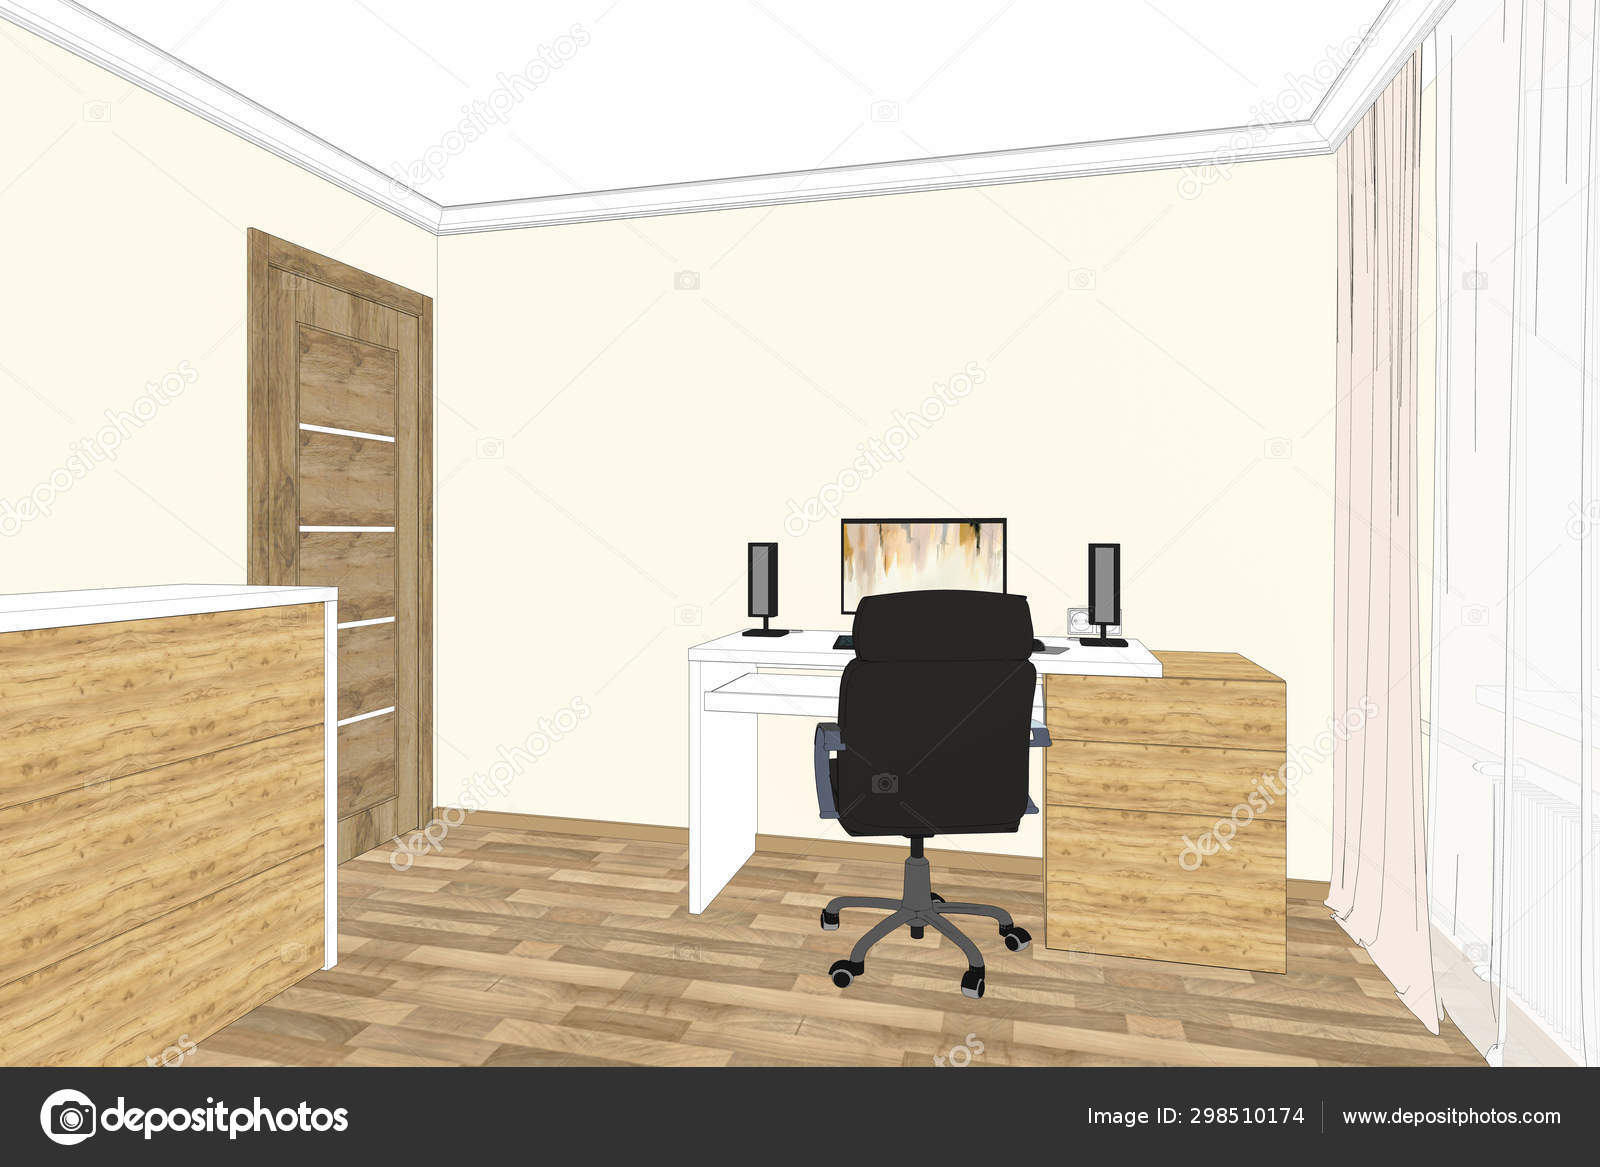 Illustration Home Office Interior Furniture Design Home Office Sketch Perspective Stock Photo C Richard Salamander 298510174